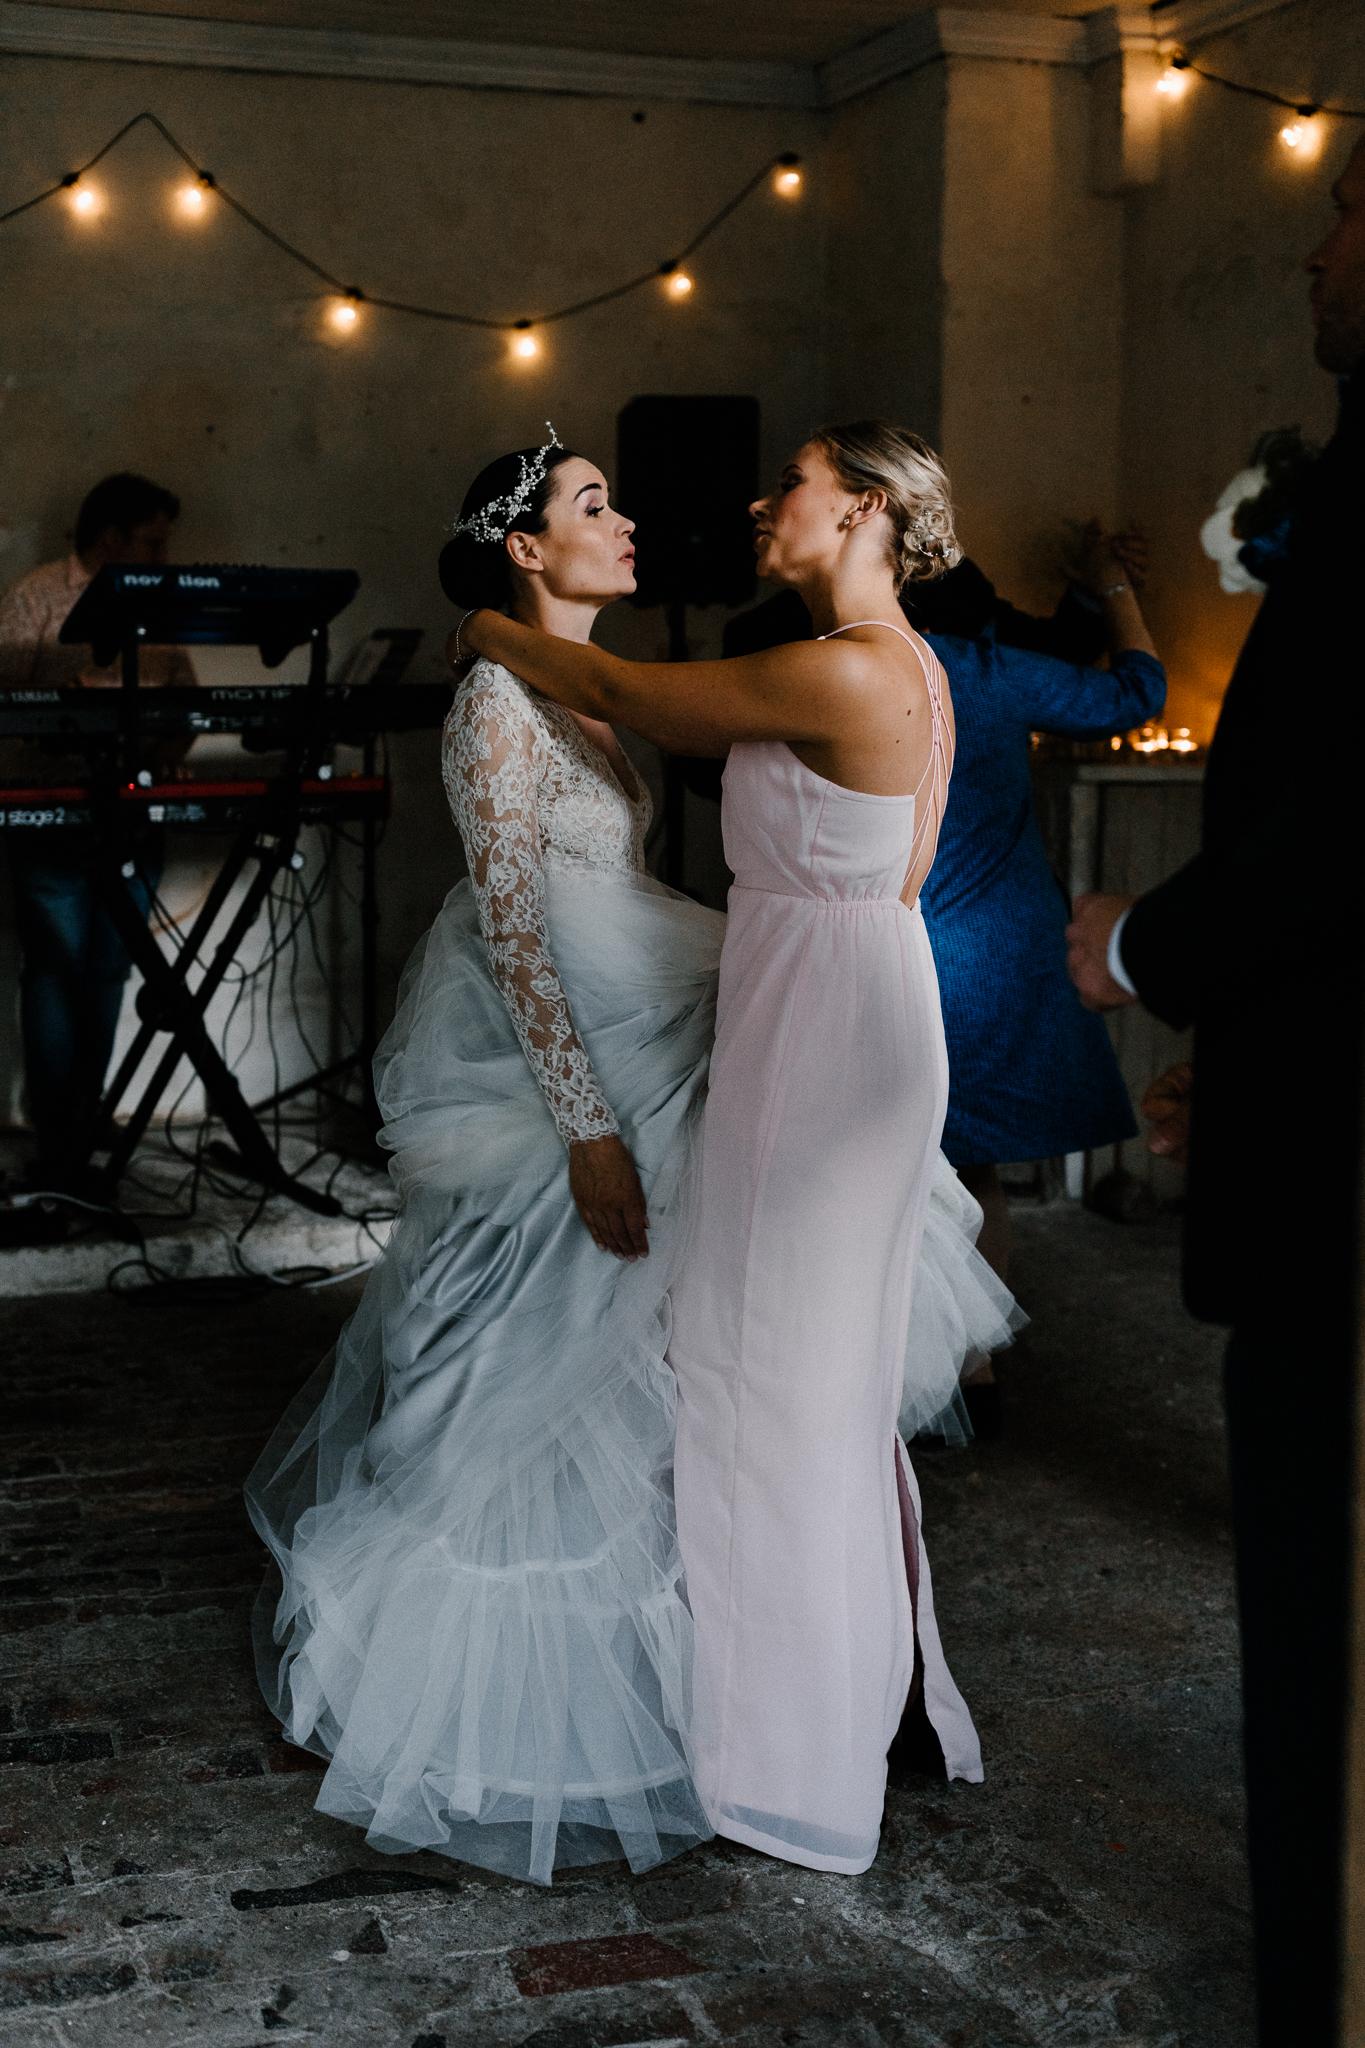 Essi + Ville   Oitbacka Gården   by Patrick Karkkolainen Wedding Photography-324.jpg